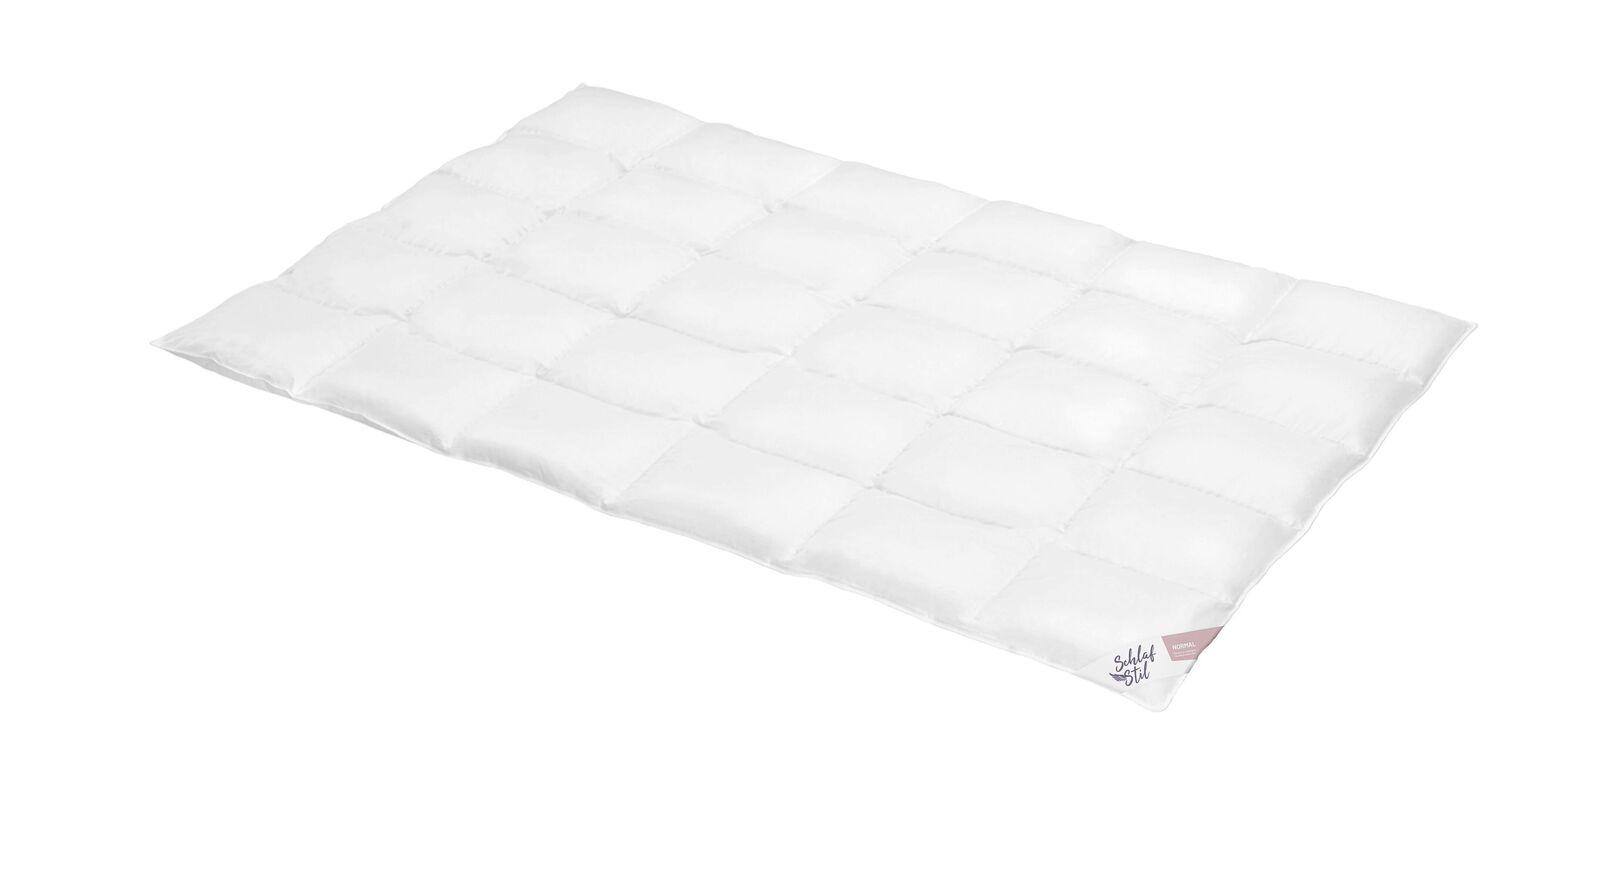 SCHLAFSTIL Daunen-Bettdecke D500 normal mit Baumwollbezug